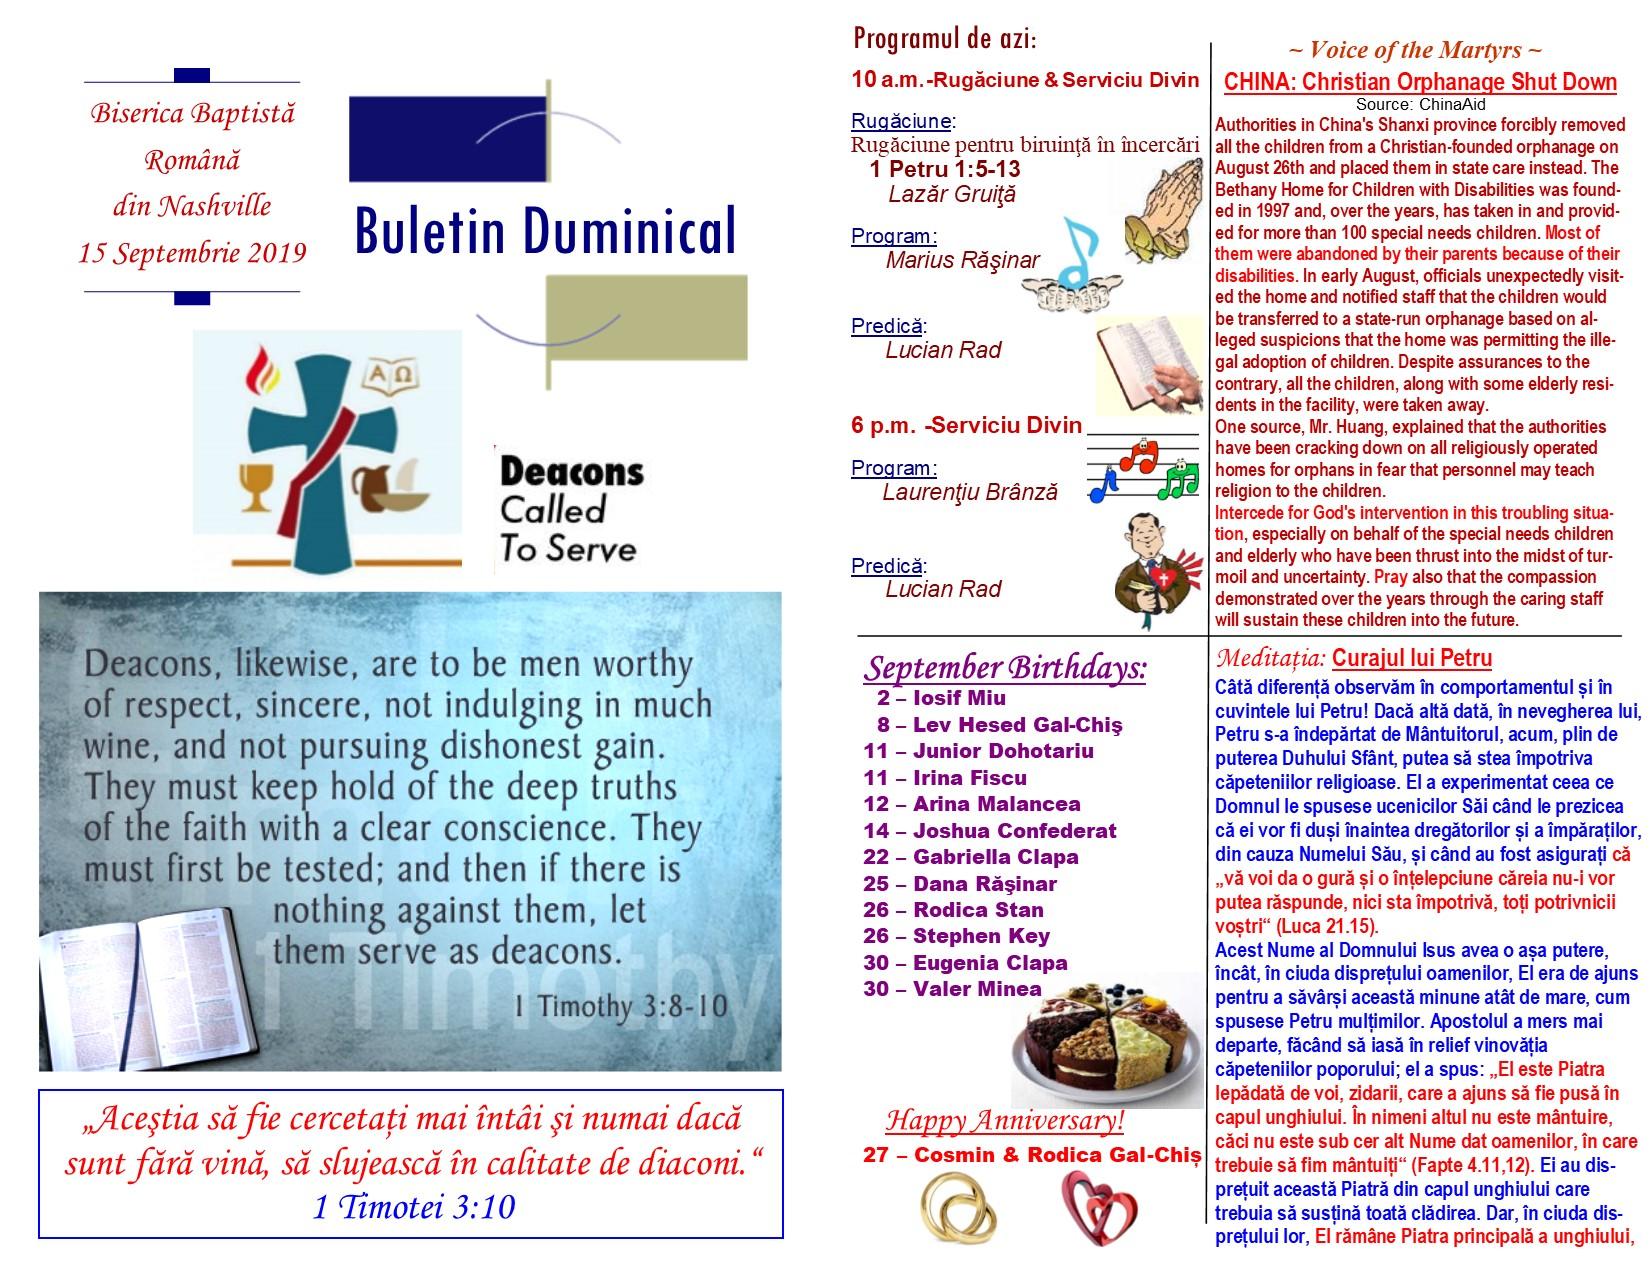 Buletin 09-15-19 page 1 & 2